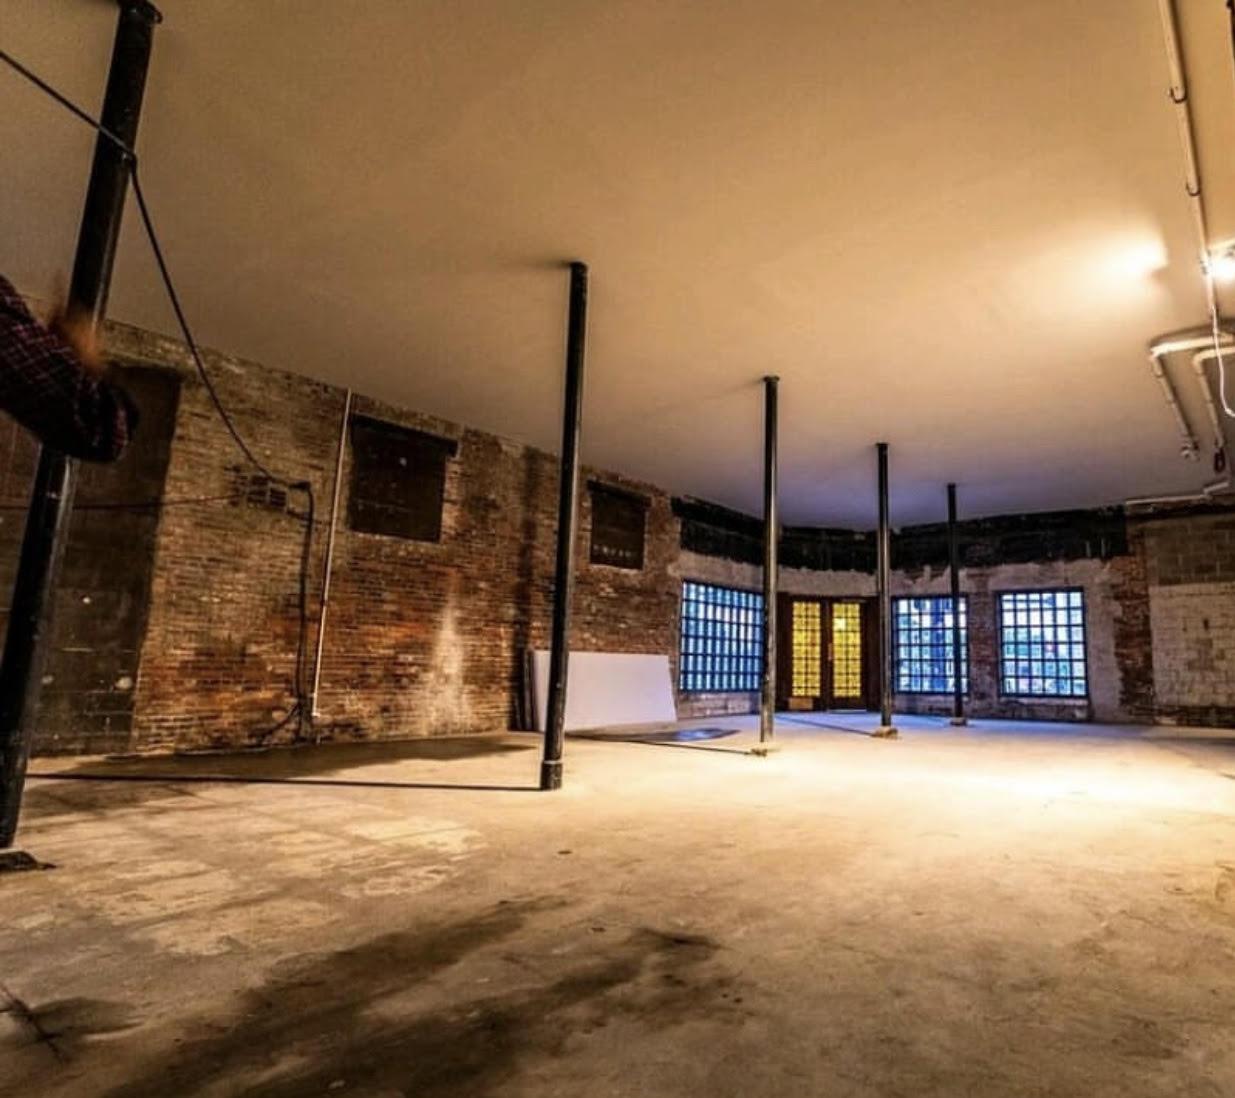 Empty room with brick walls and concrete floor